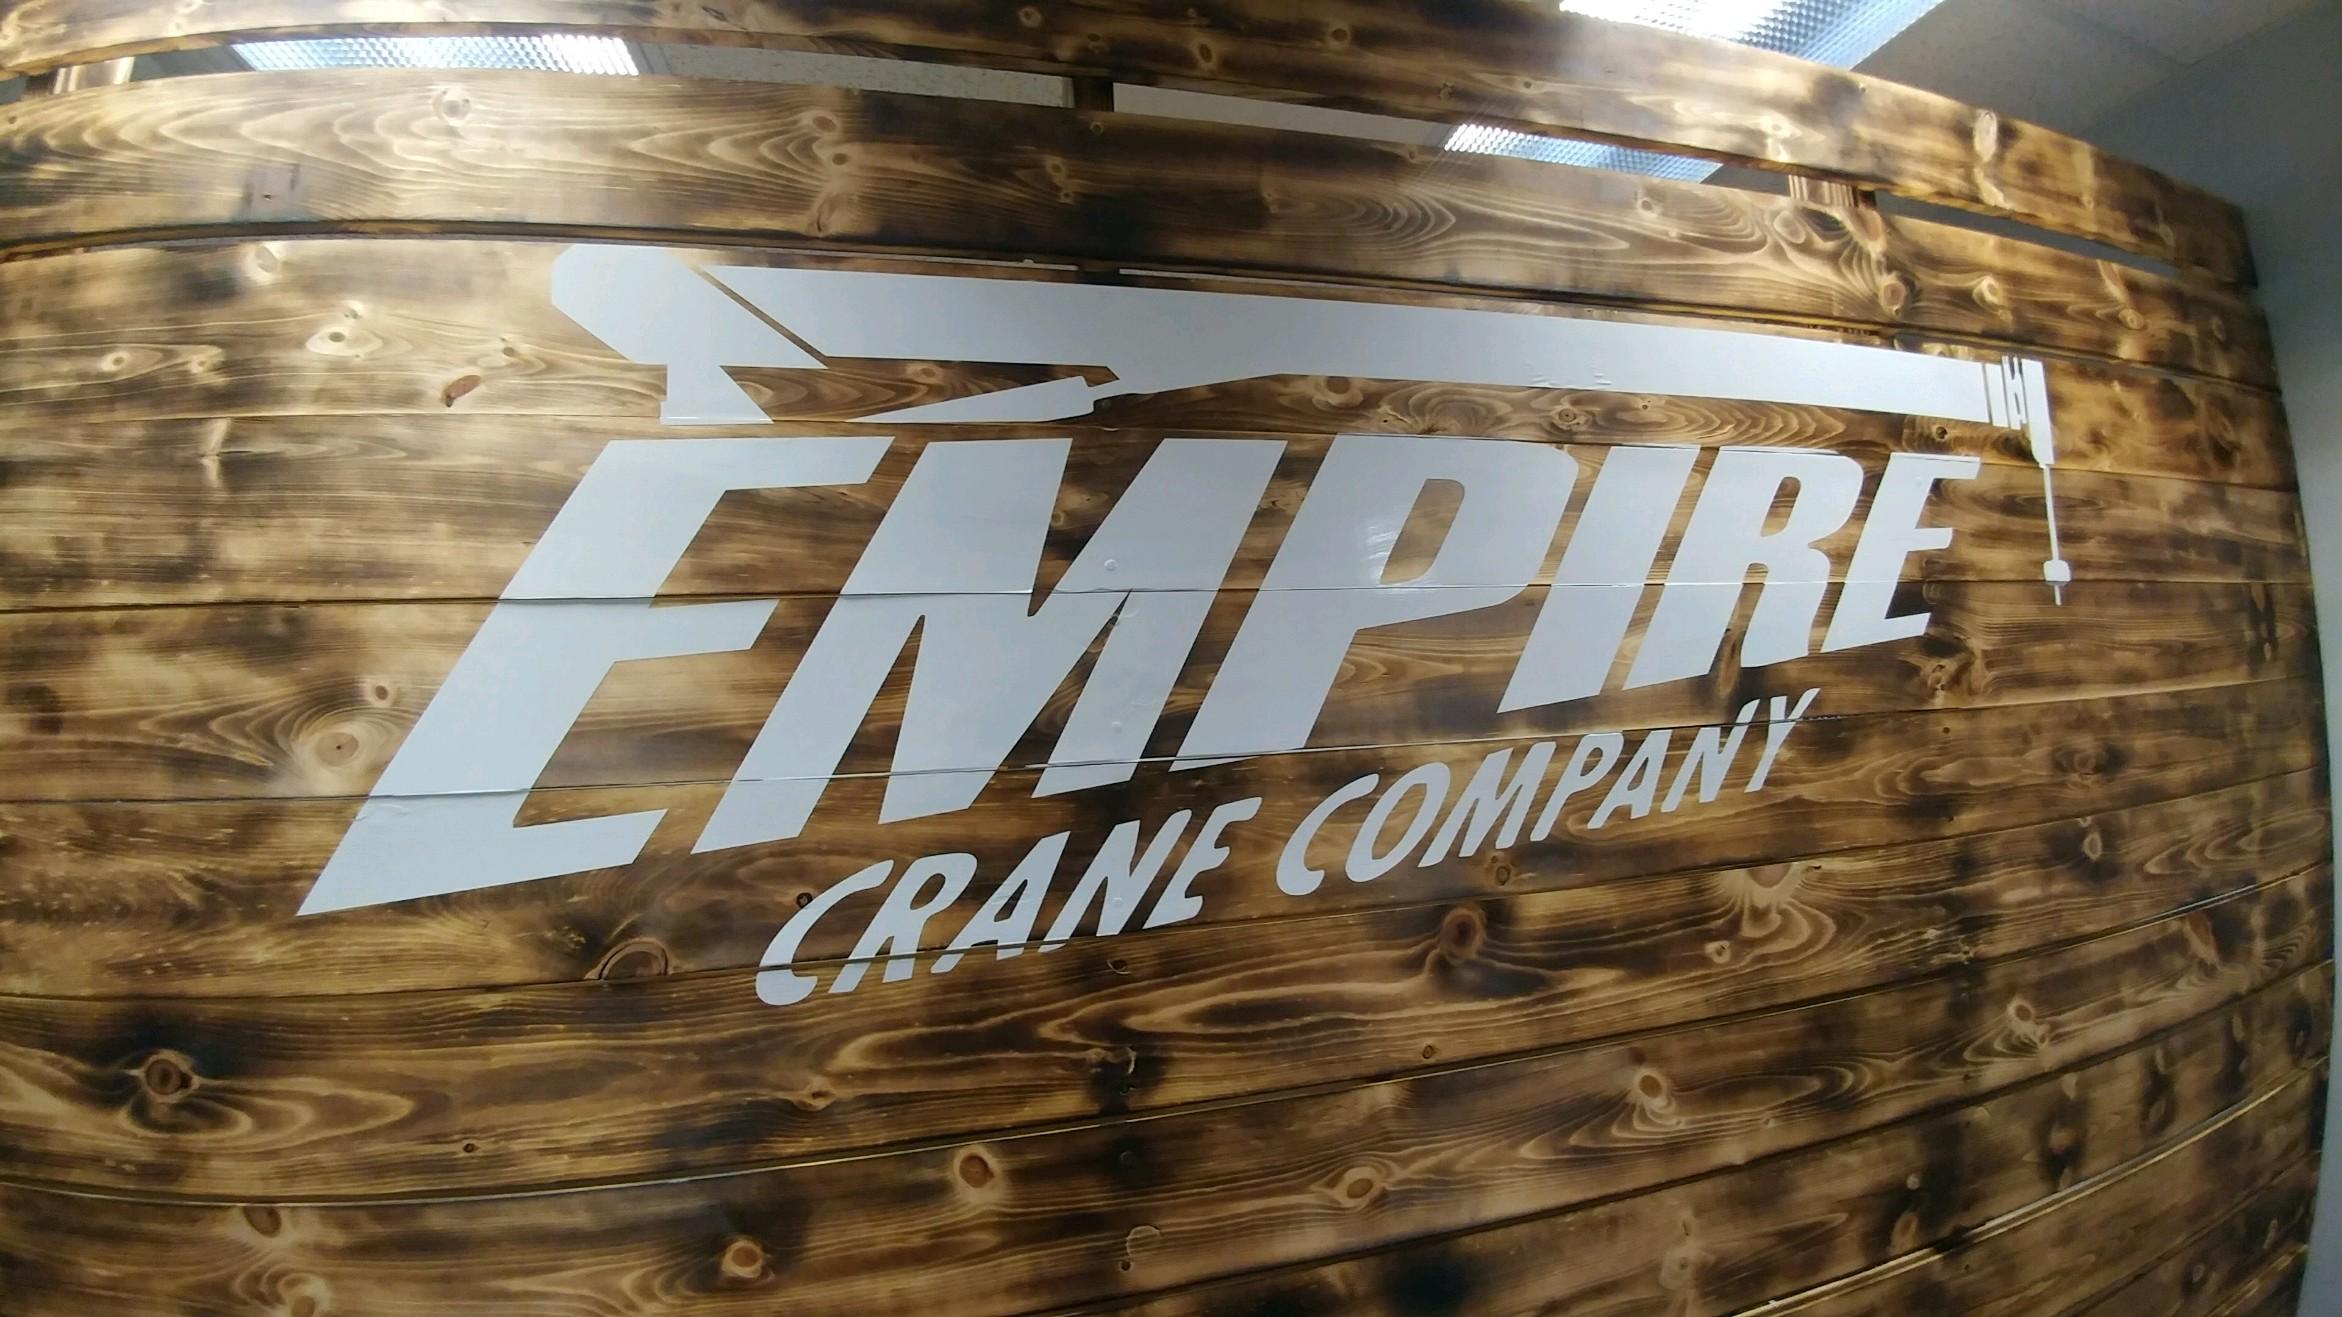 Upgraded space for Empire Crane in Bridgewater, NJ ⋆ Crane